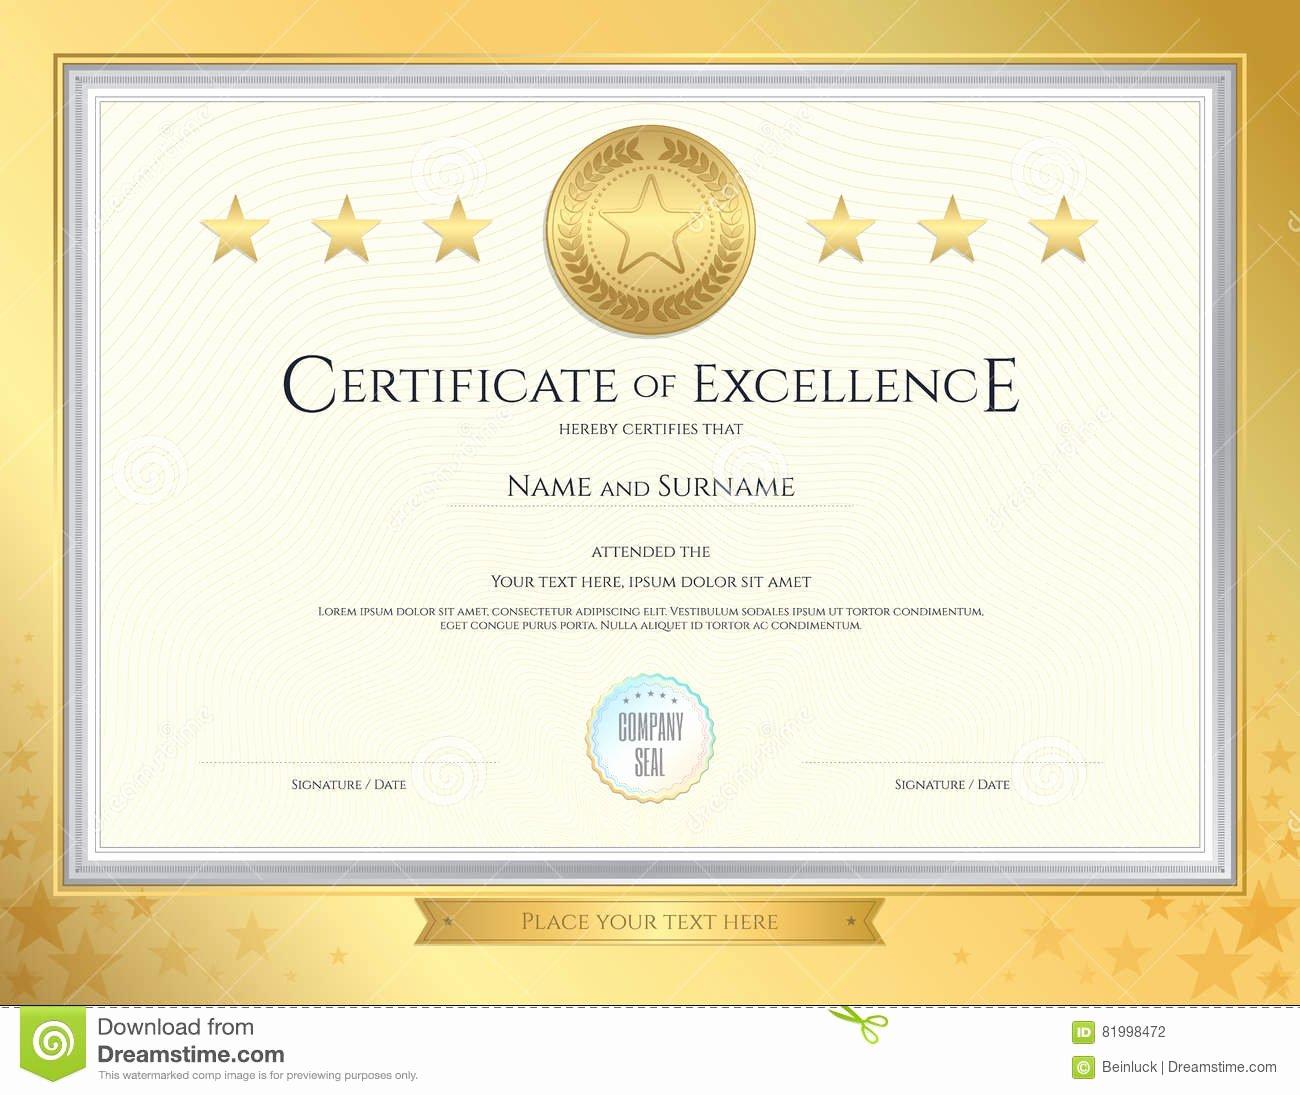 stock illustration elegant certificate template excellence achievement appreciation pletion gold border background image